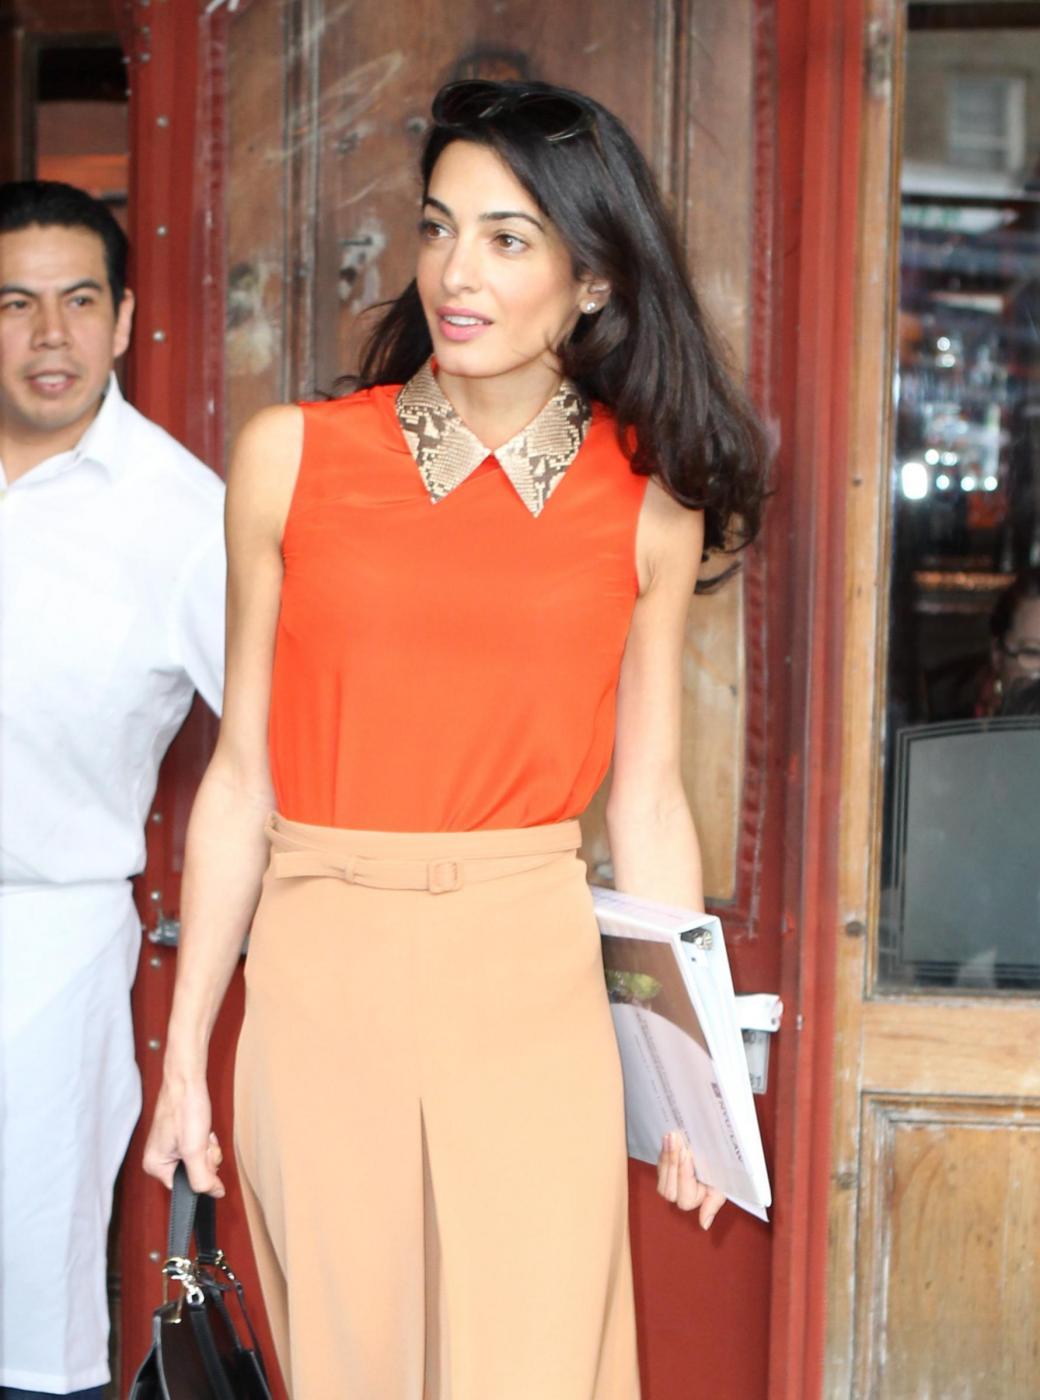 Amal Alamuddin magrissima, lady Clooney quasi scheletrica FOTO 1